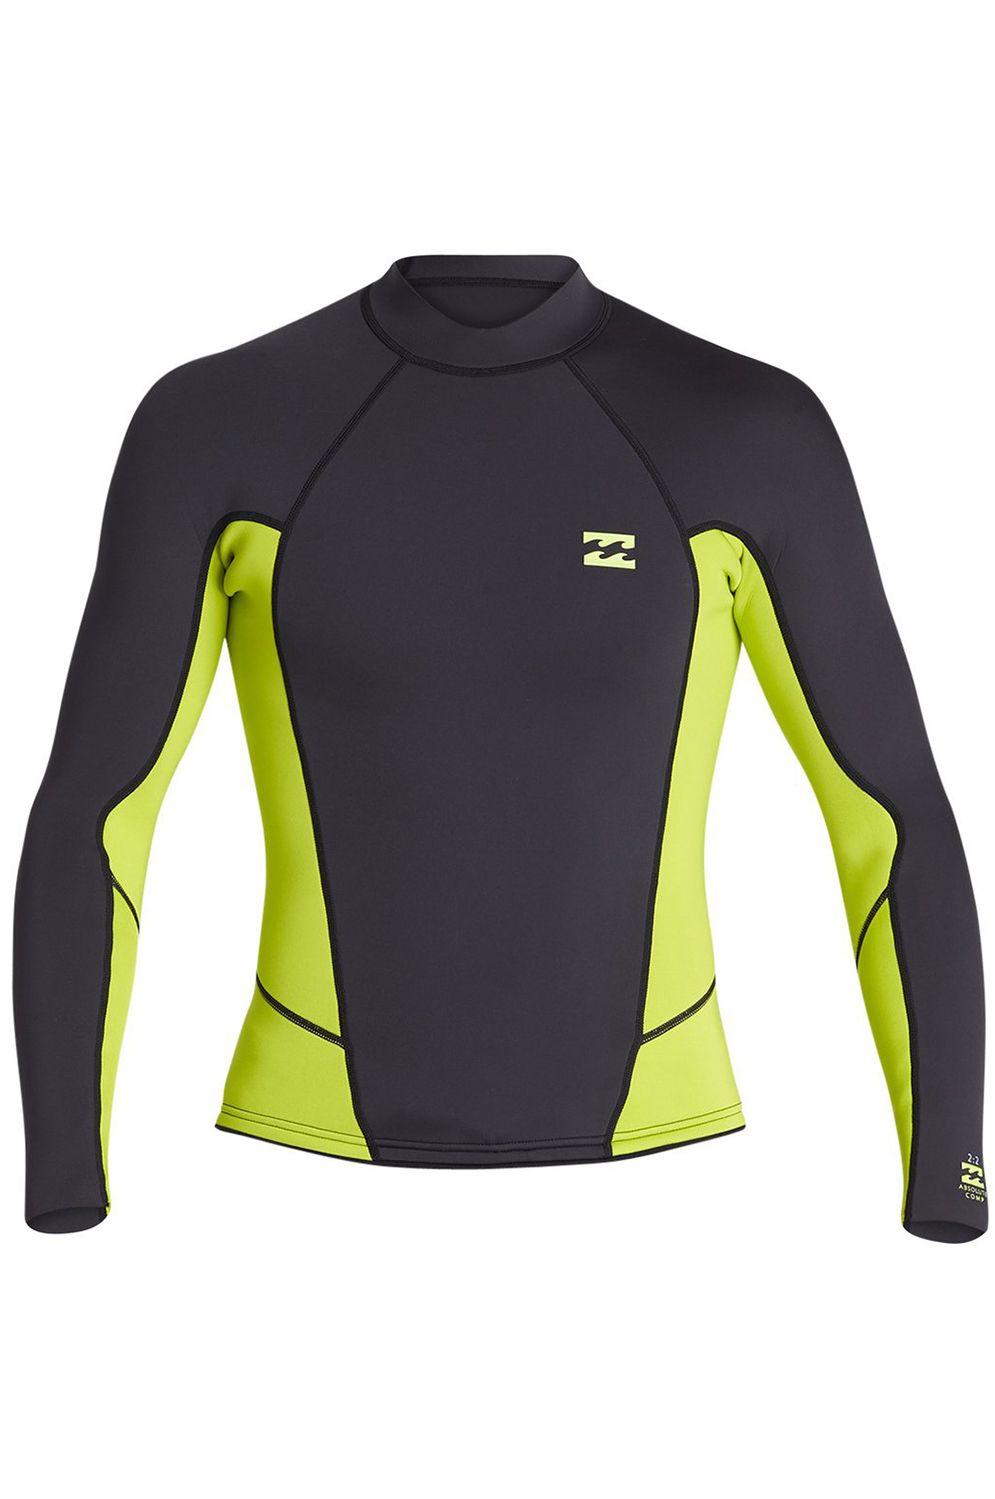 Billabong Wetsuit 202 ABSOLUTE COMP LS Lime